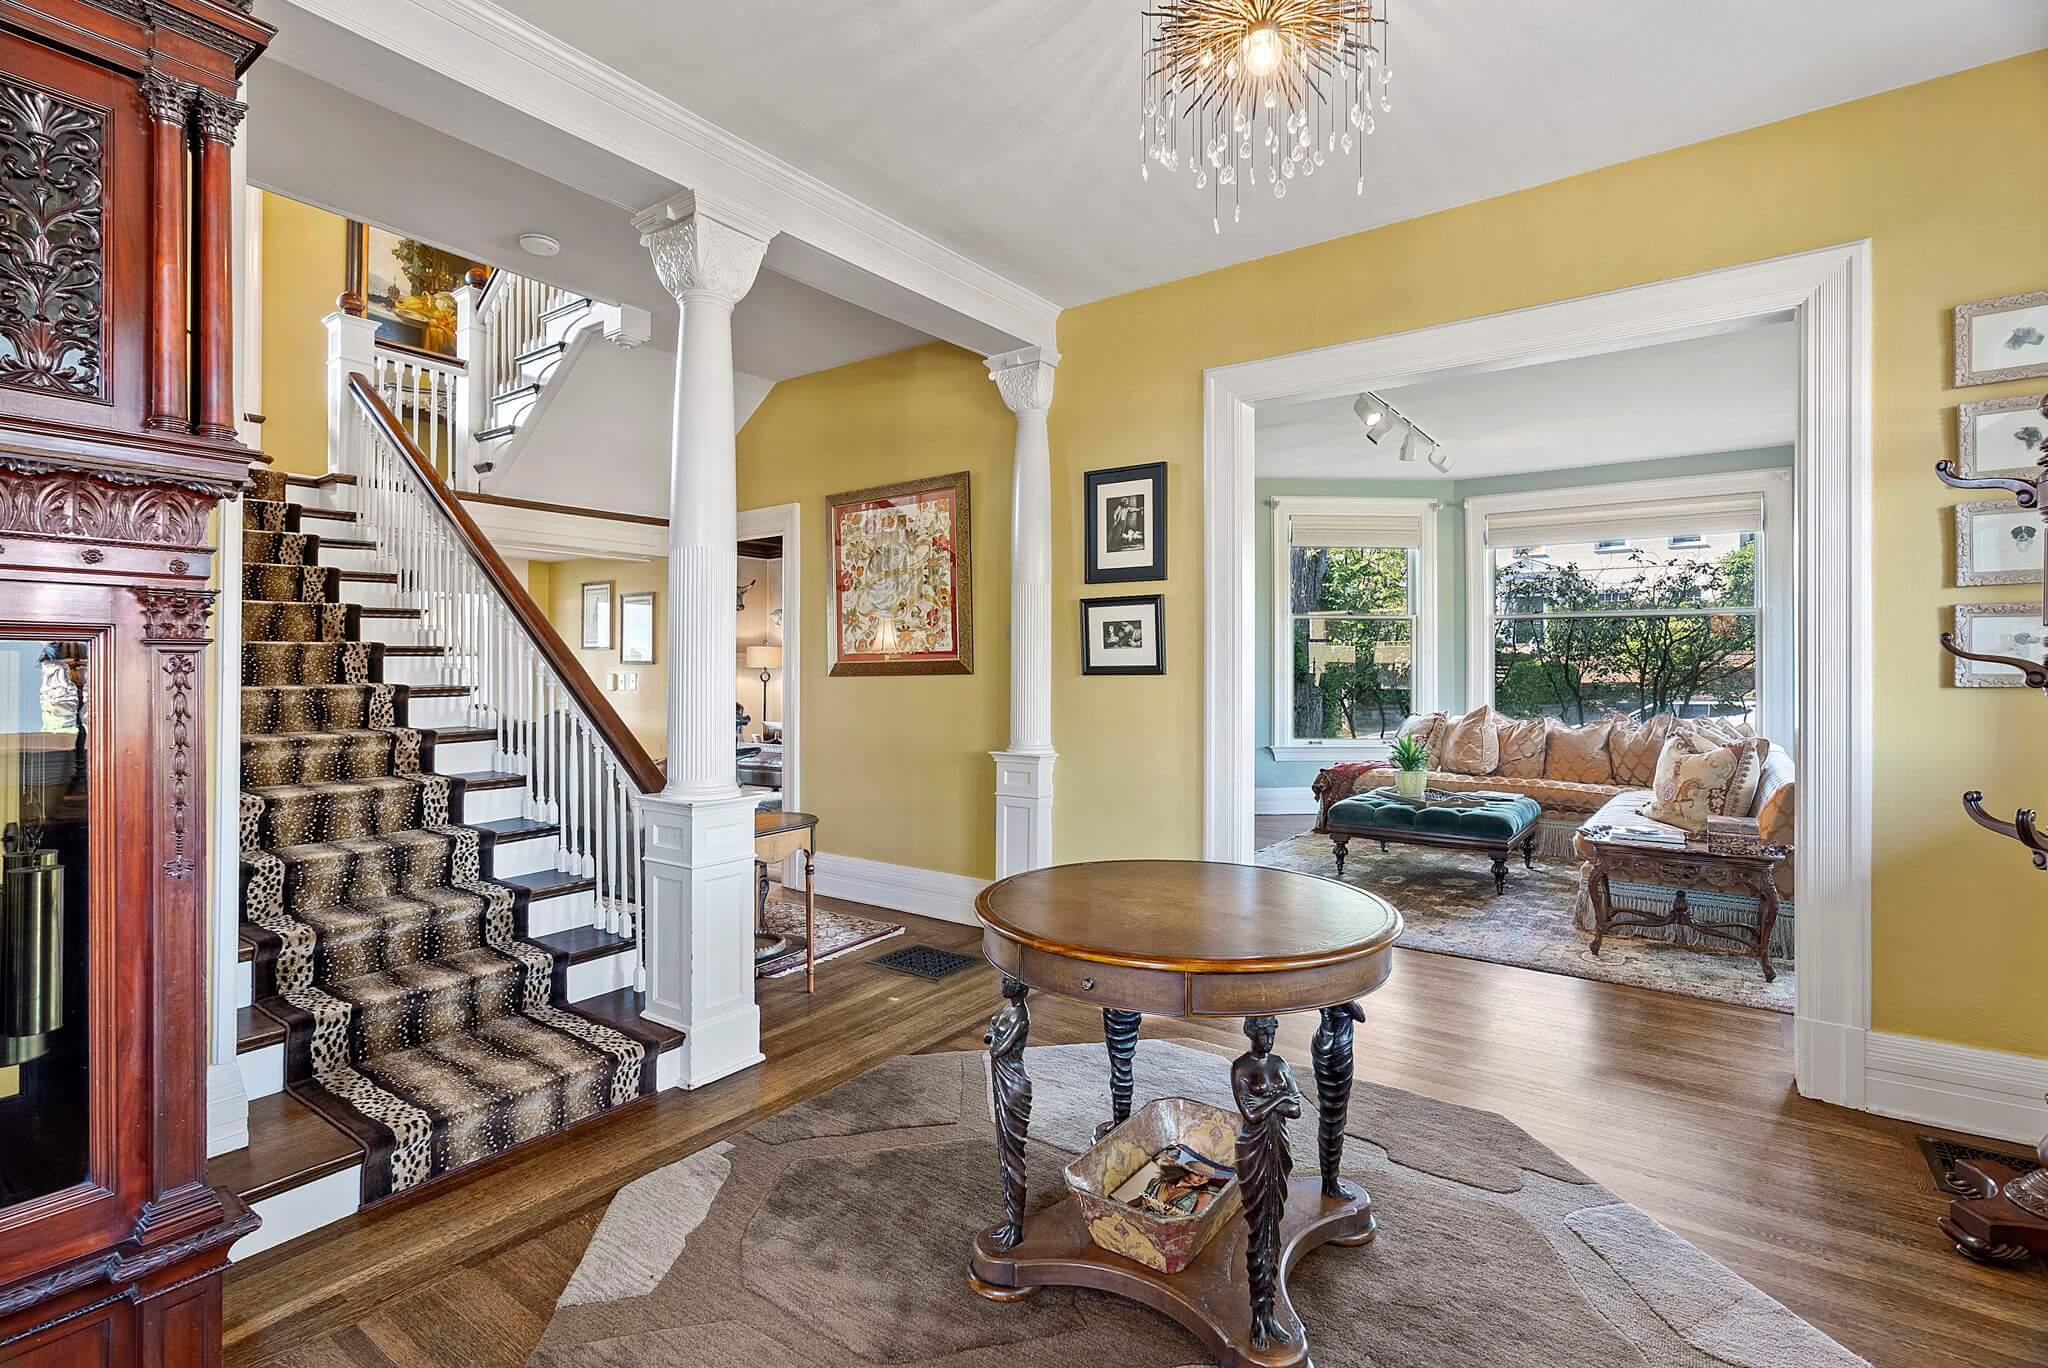 Impressive formal entry with refinished hardwood floors